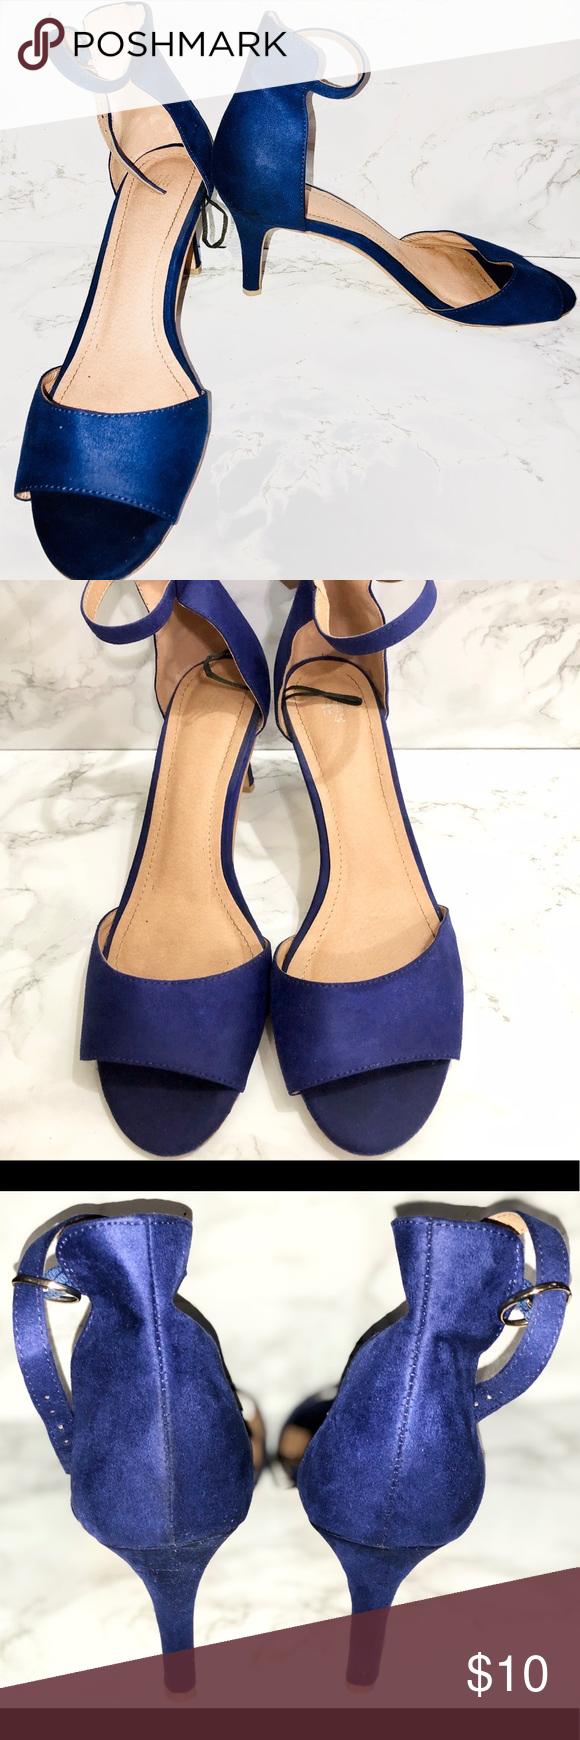 H M Suede Heels Sandals Heels Ankle Strap Size 8 5 Blue Suede Heels Sandals Heels